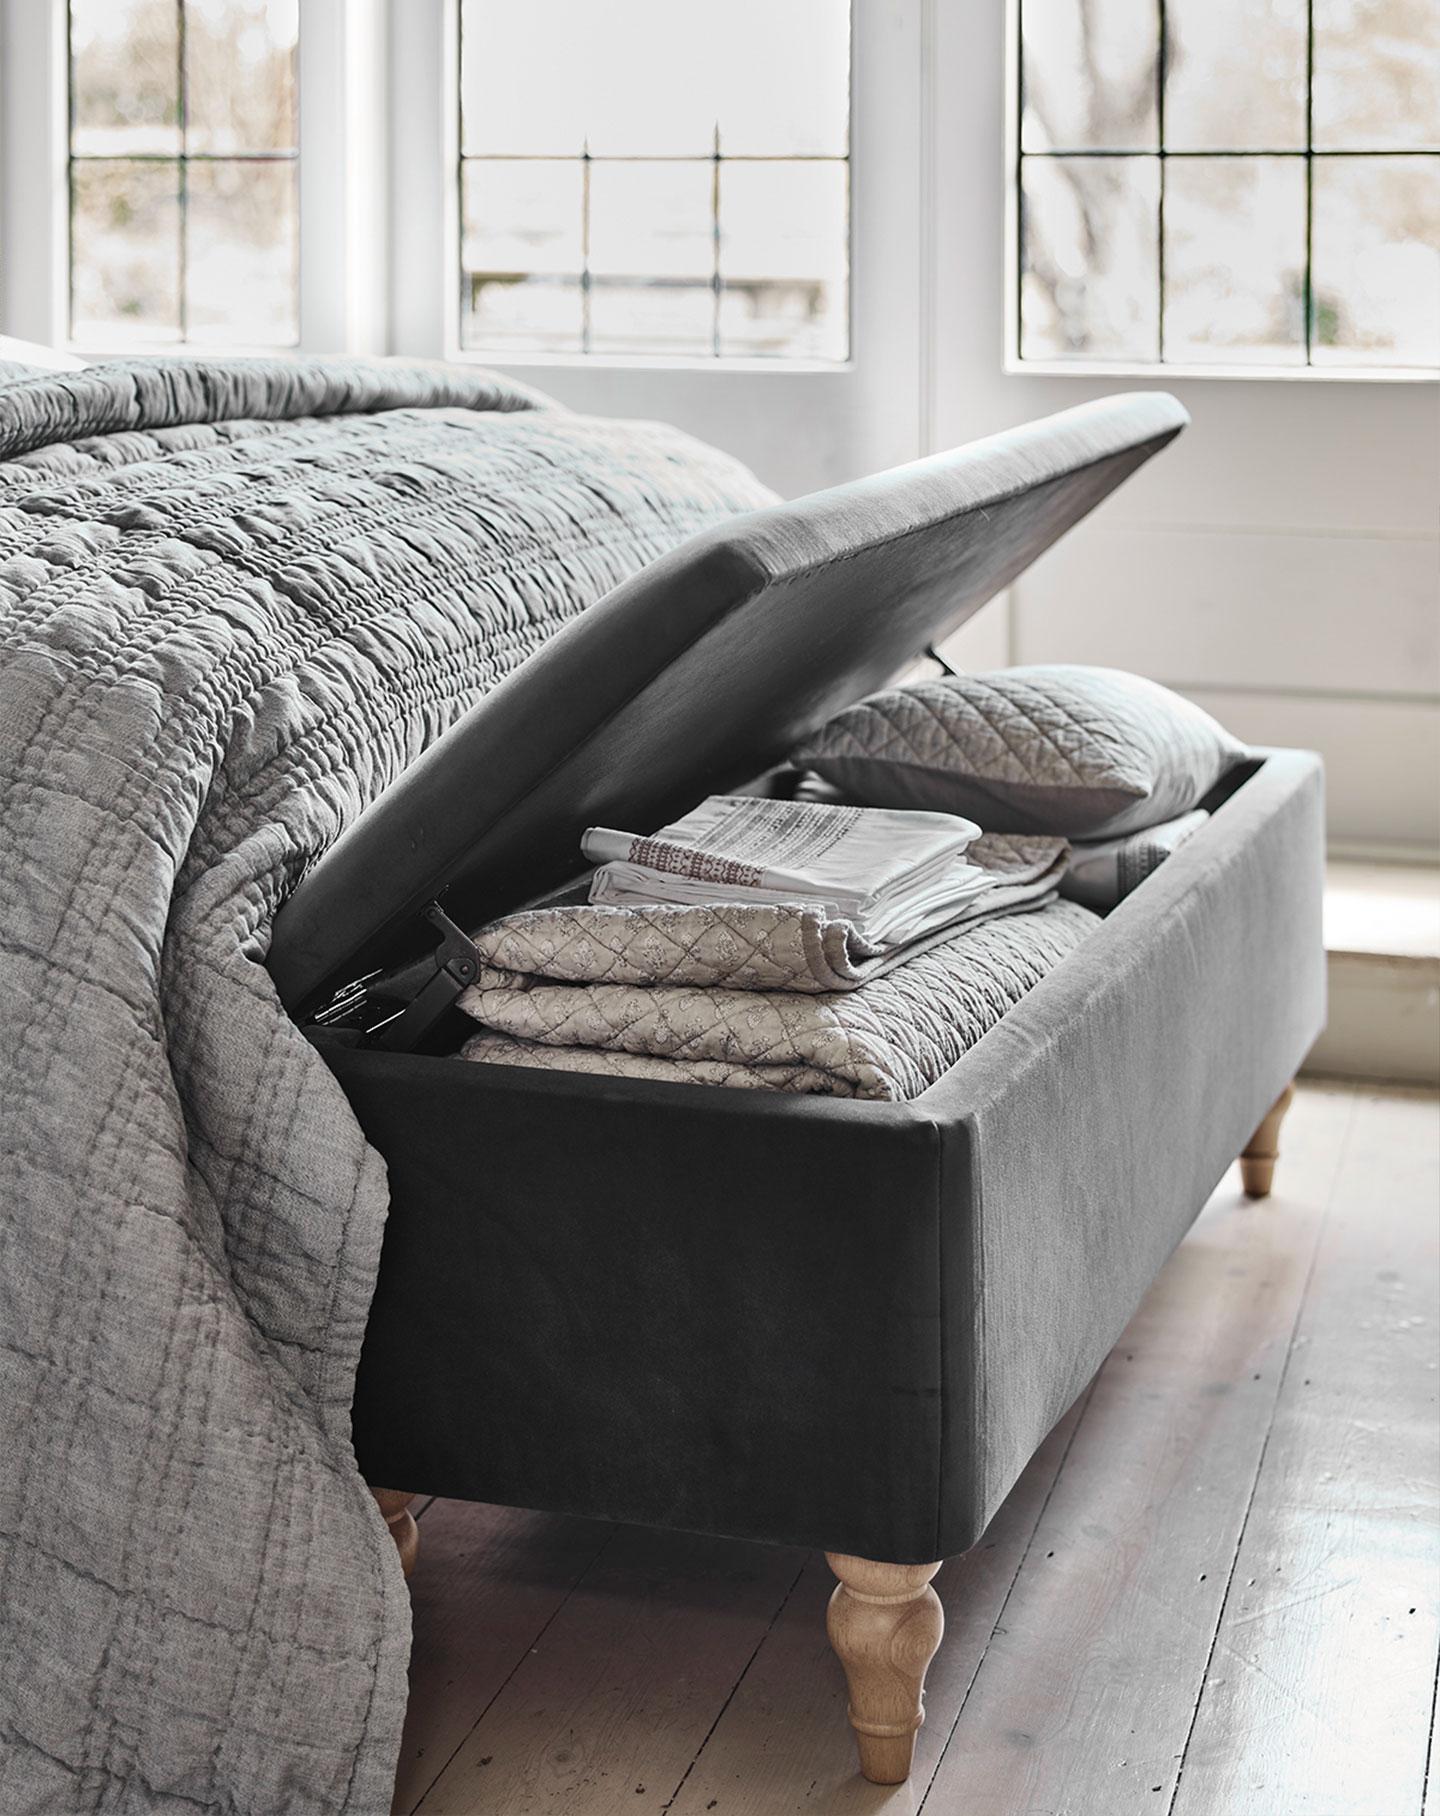 Cotswold Co Huxley velvet grey Ottoman, blanket box, bedspread, bedroom storage.